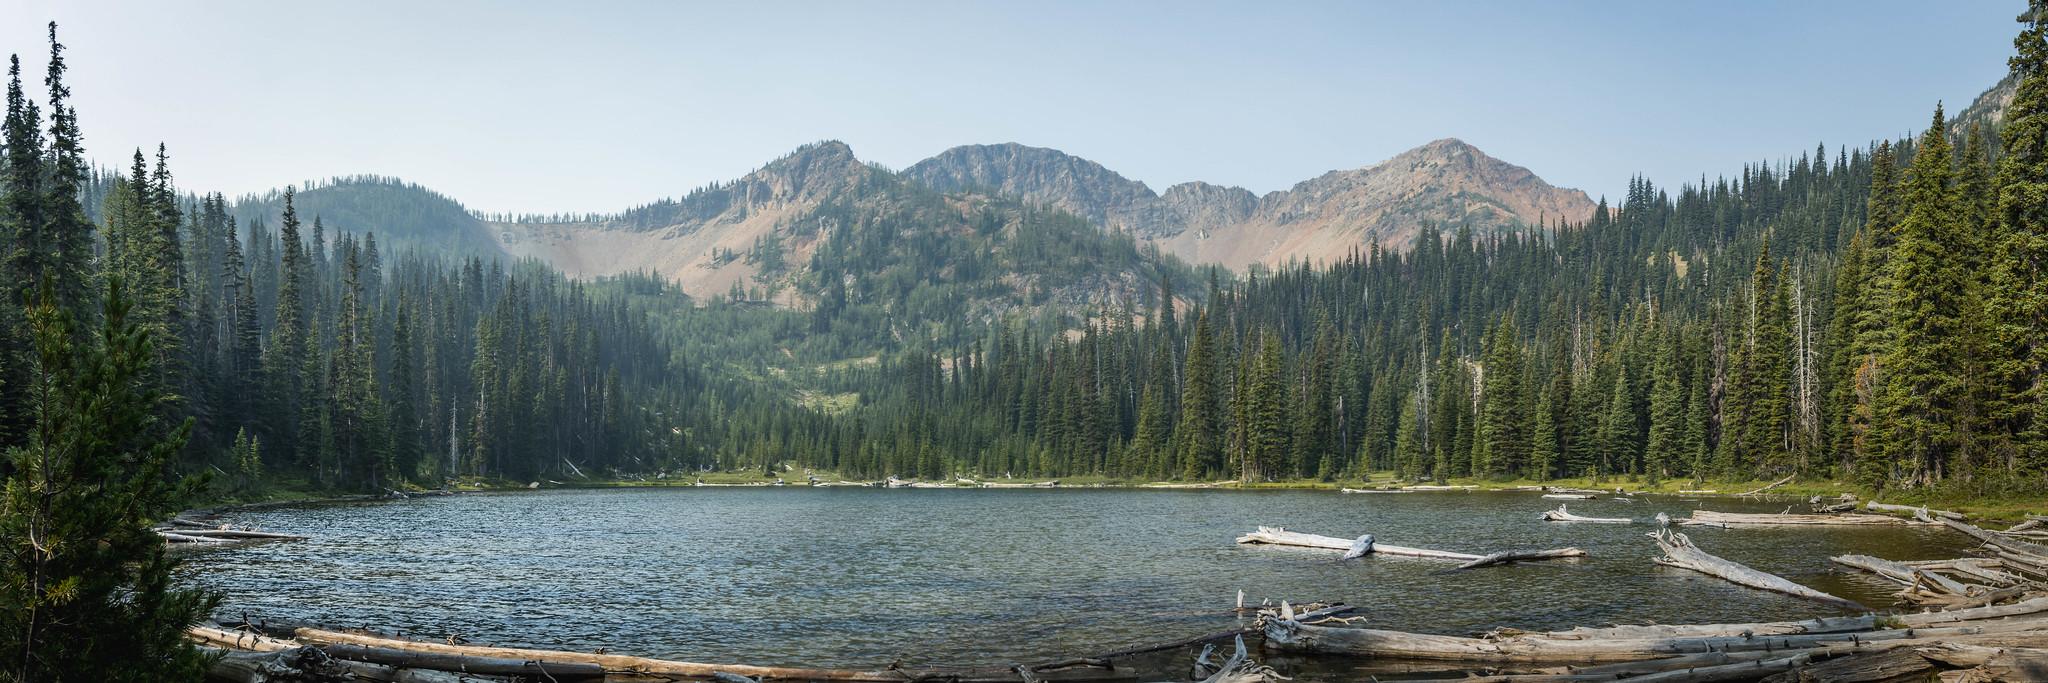 Silver Lake southern panoramic view